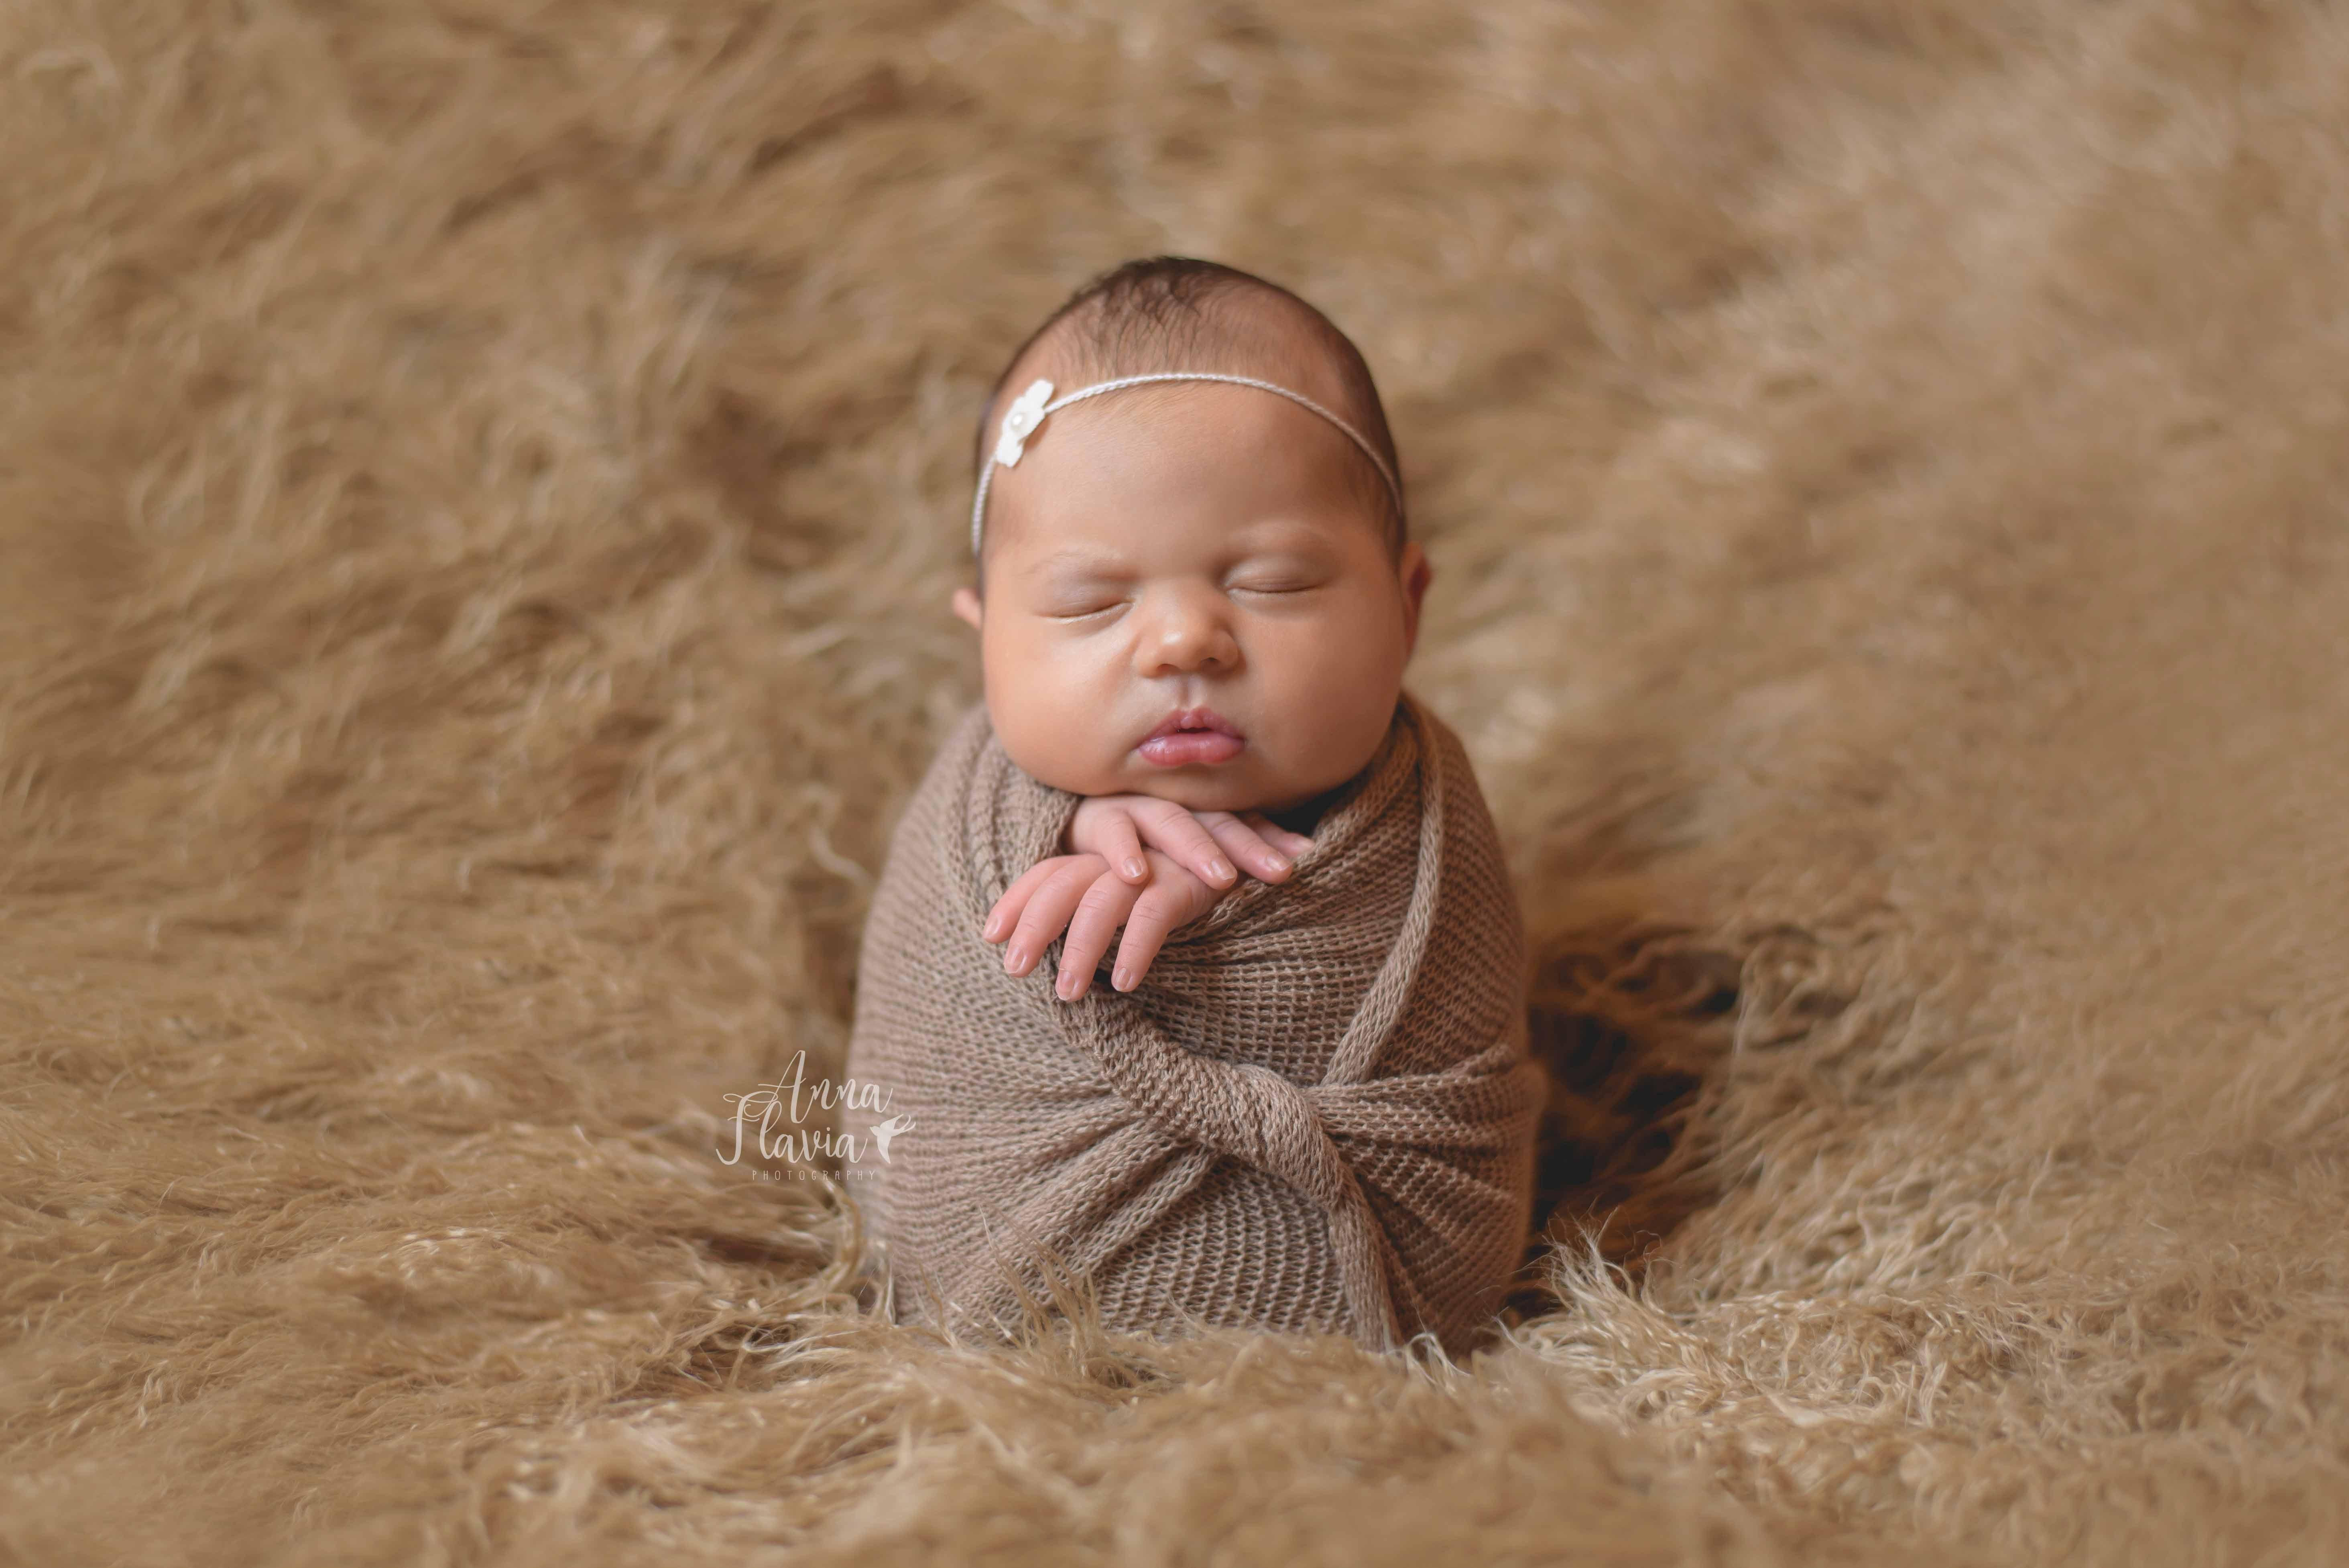 photographer_dublin_anna_flavia_newborn_maternity_11